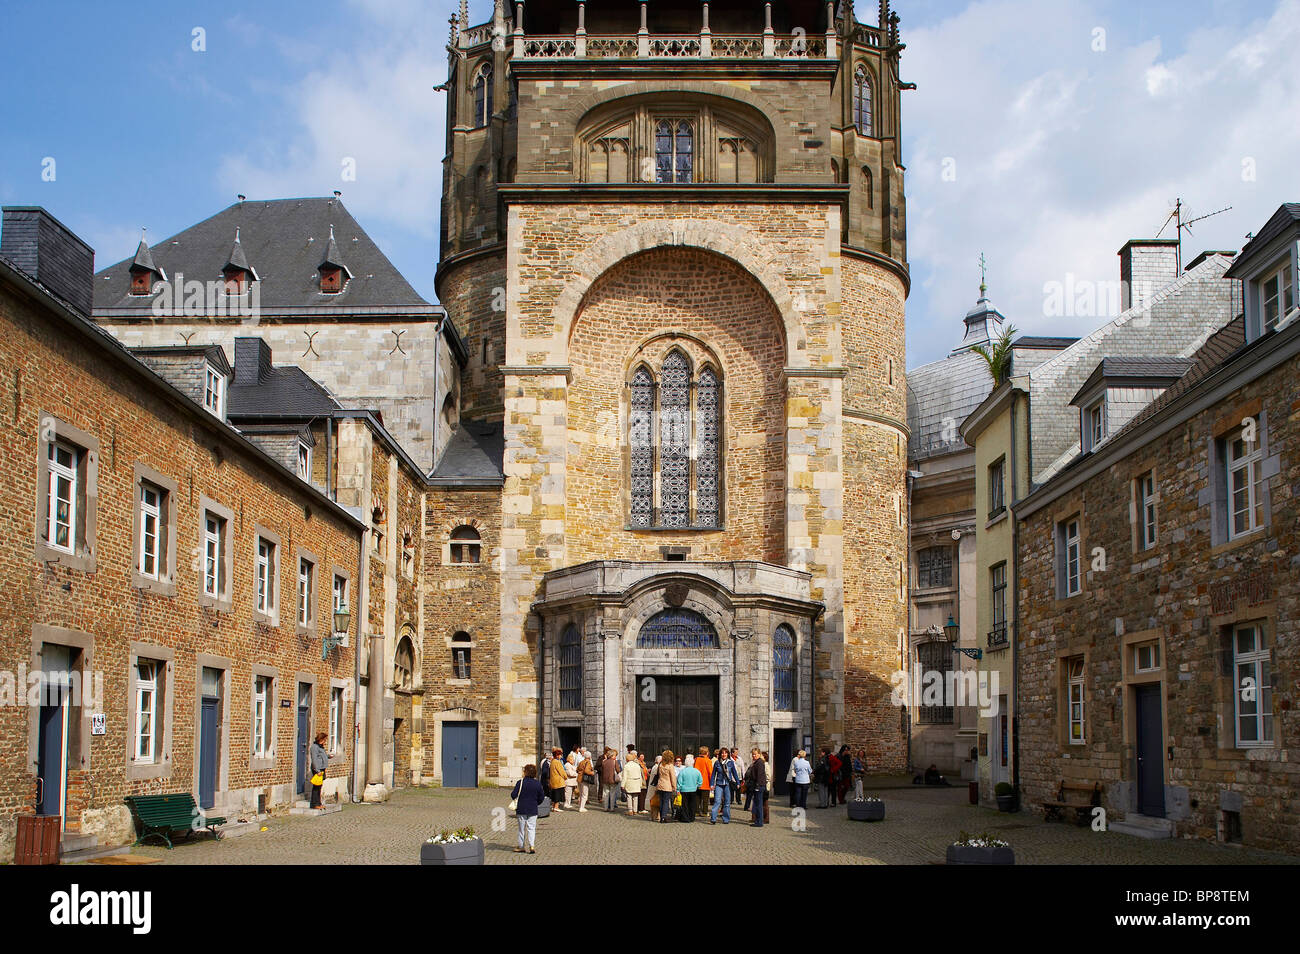 indoor photo, day, Aachen Catherdal, Aachen, North Rhine-Westphalia, Germany, Europe - Stock Image